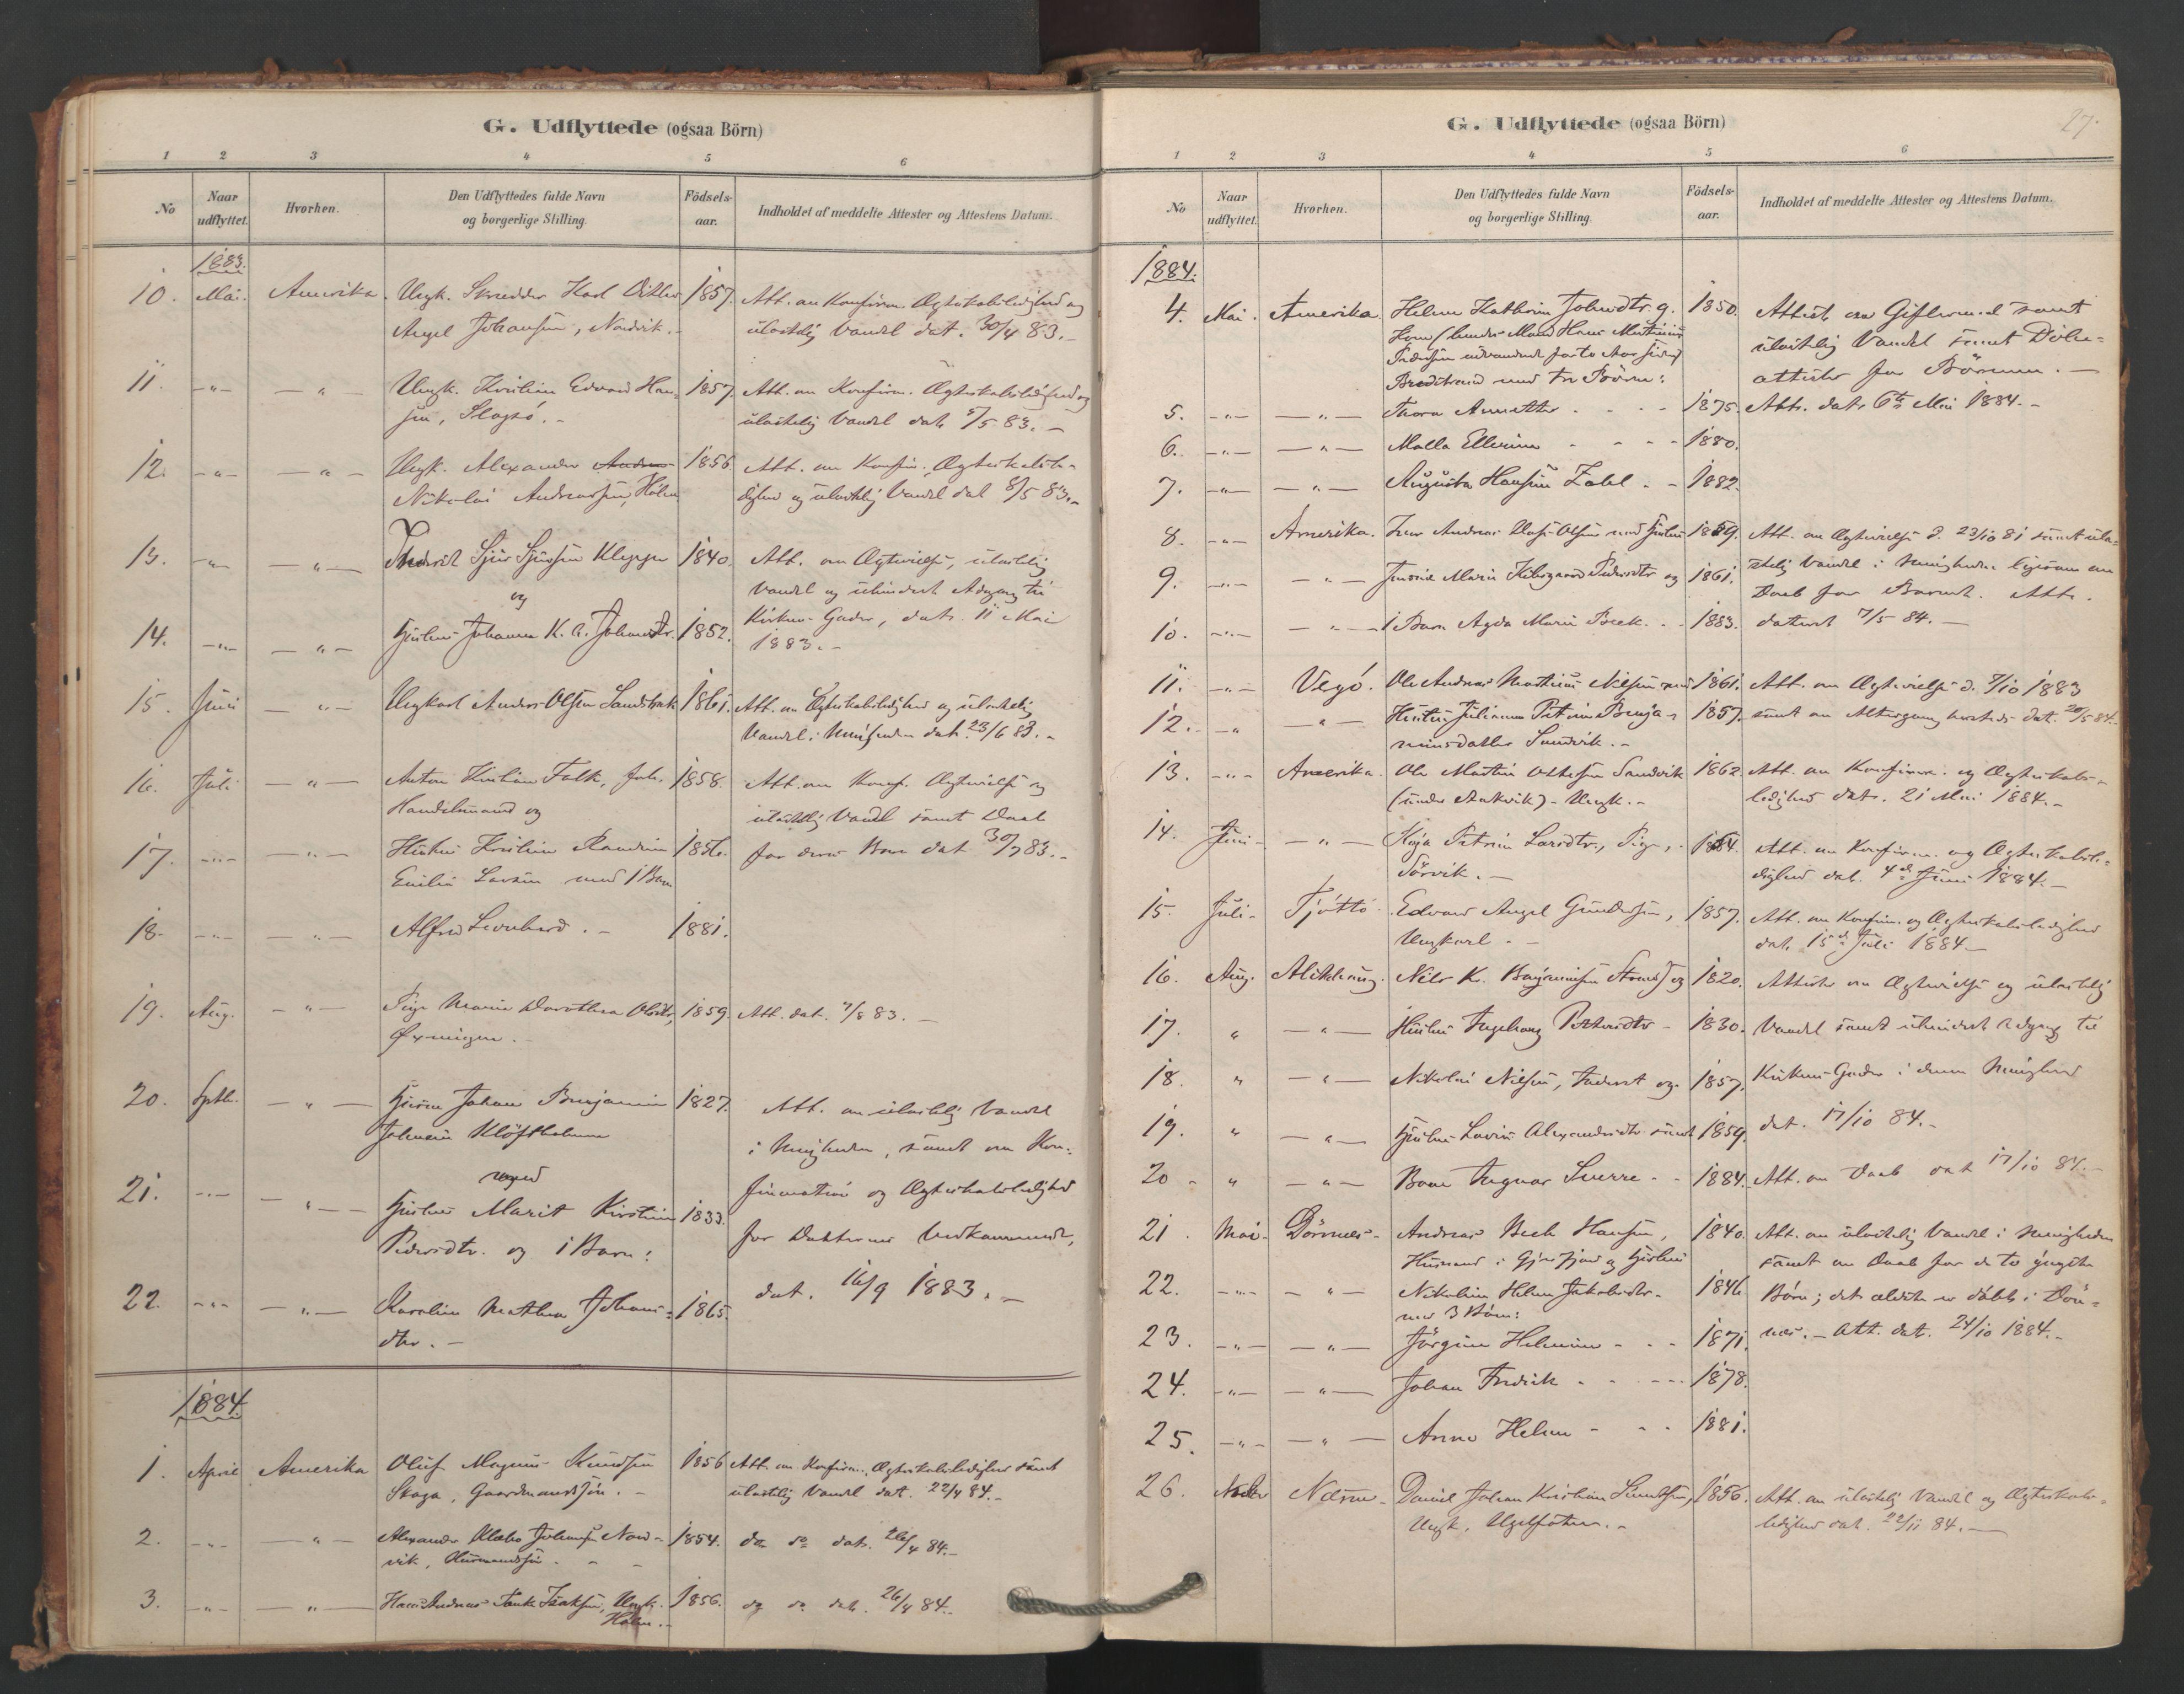 SAT, Ministerialprotokoller, klokkerbøker og fødselsregistre - Nordland, 834/L0509: Ministerialbok nr. 834A07, 1878-1937, s. 27